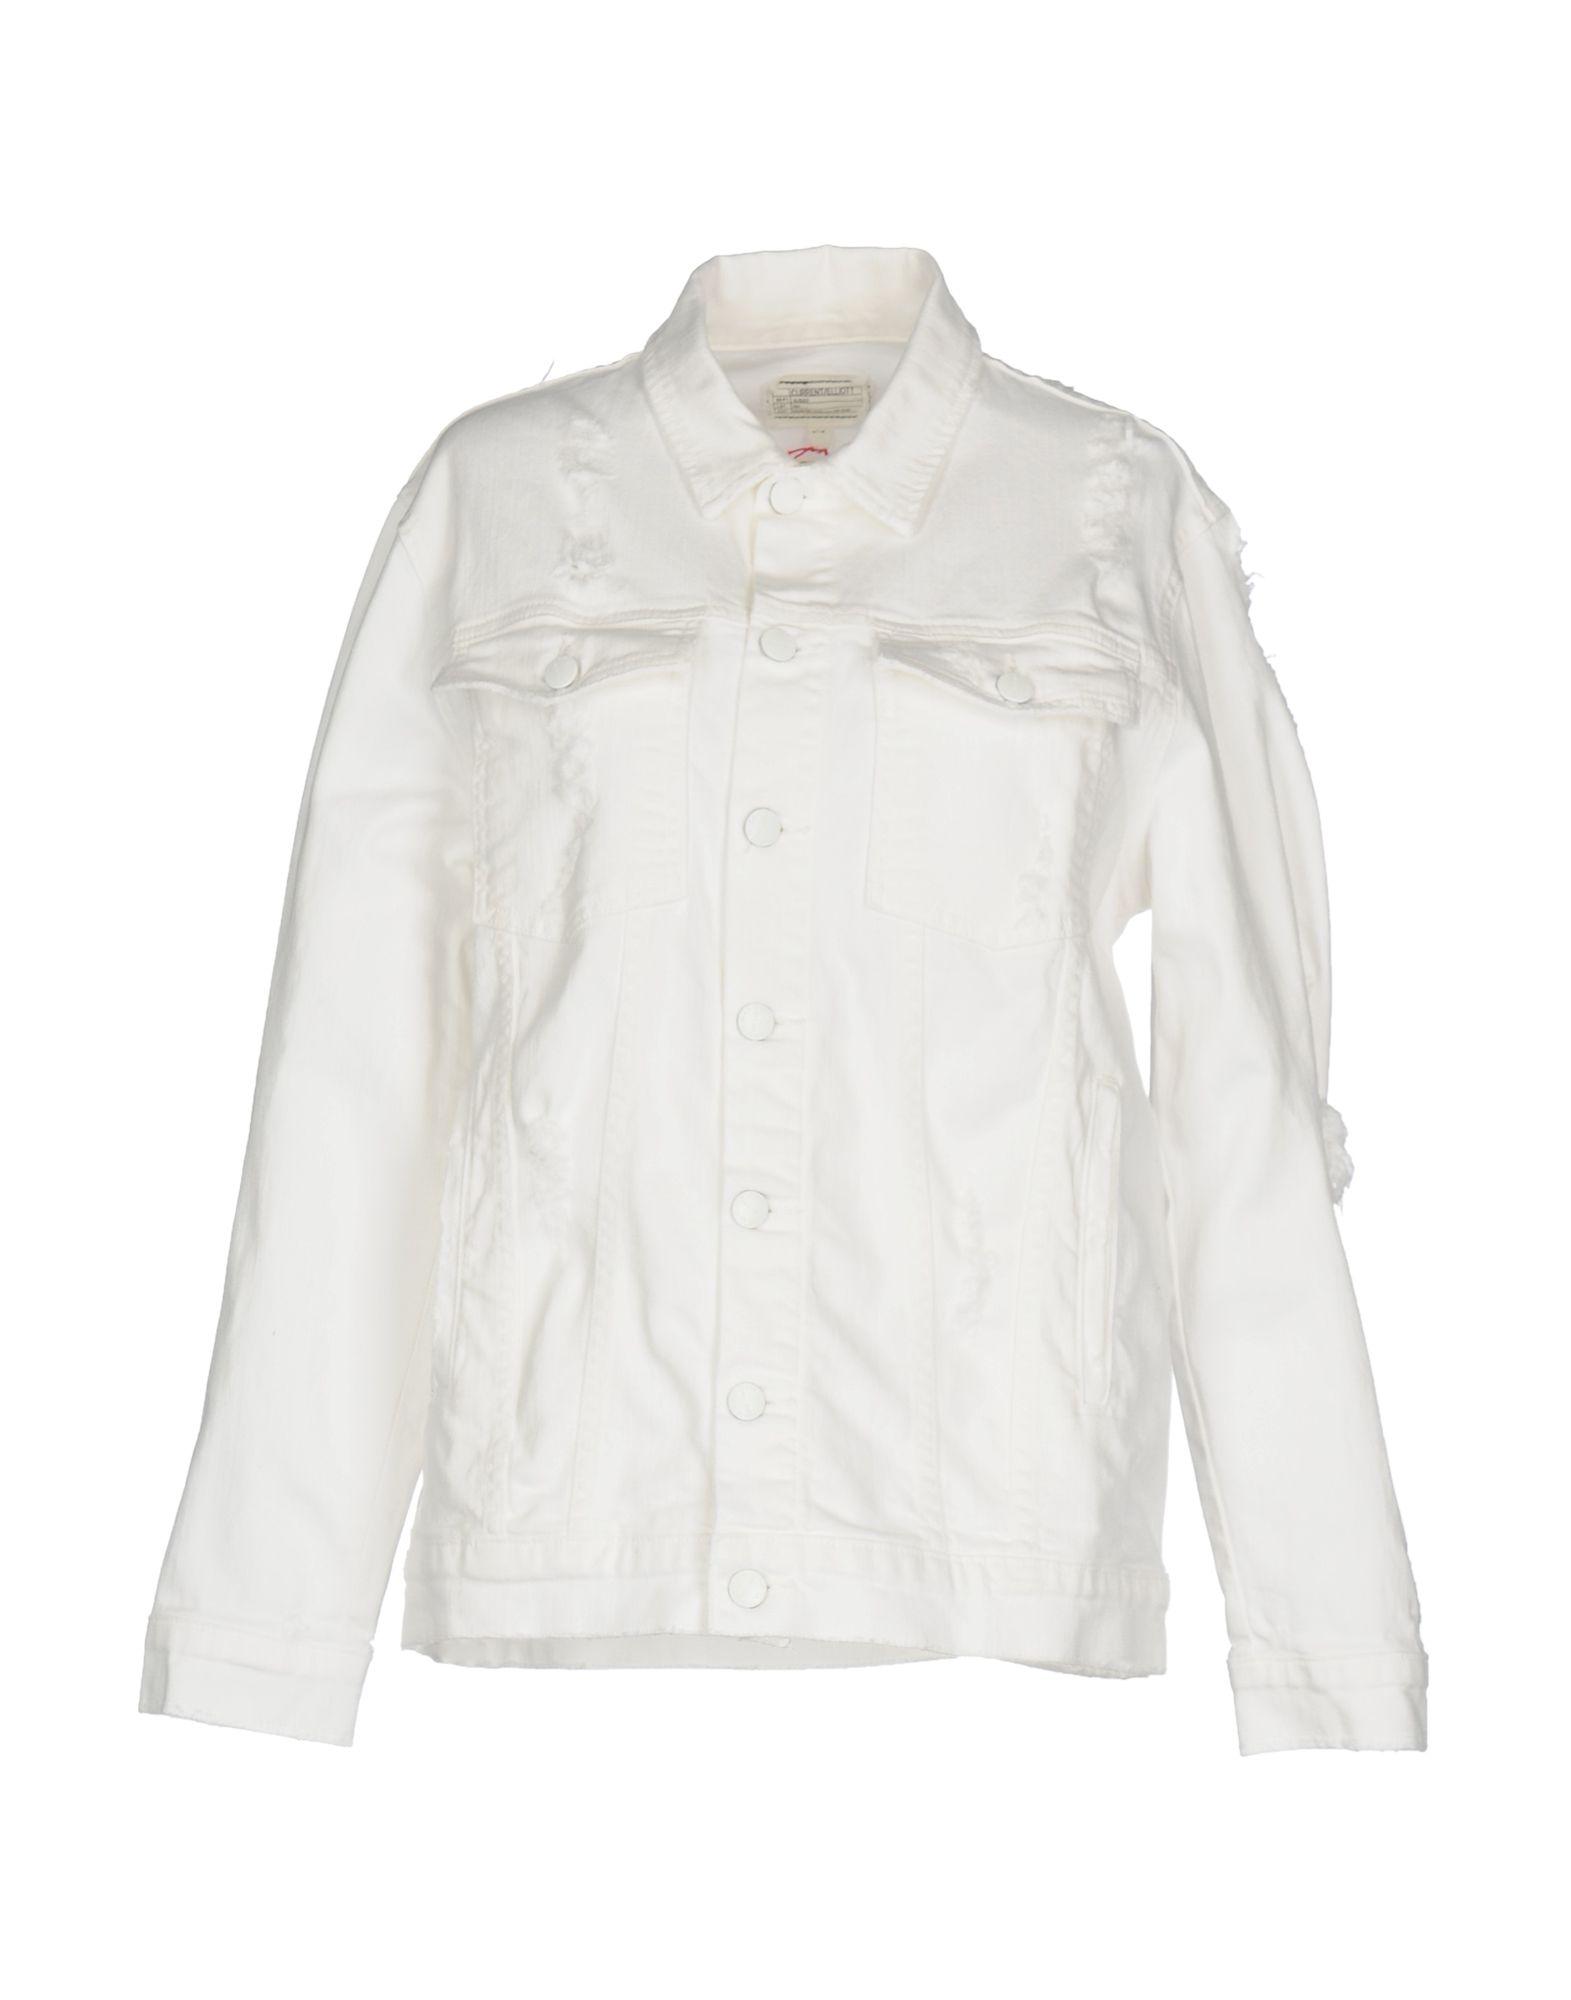 CURRENT/ELLIOTT Джинсовая верхняя одежда верхняя одежда